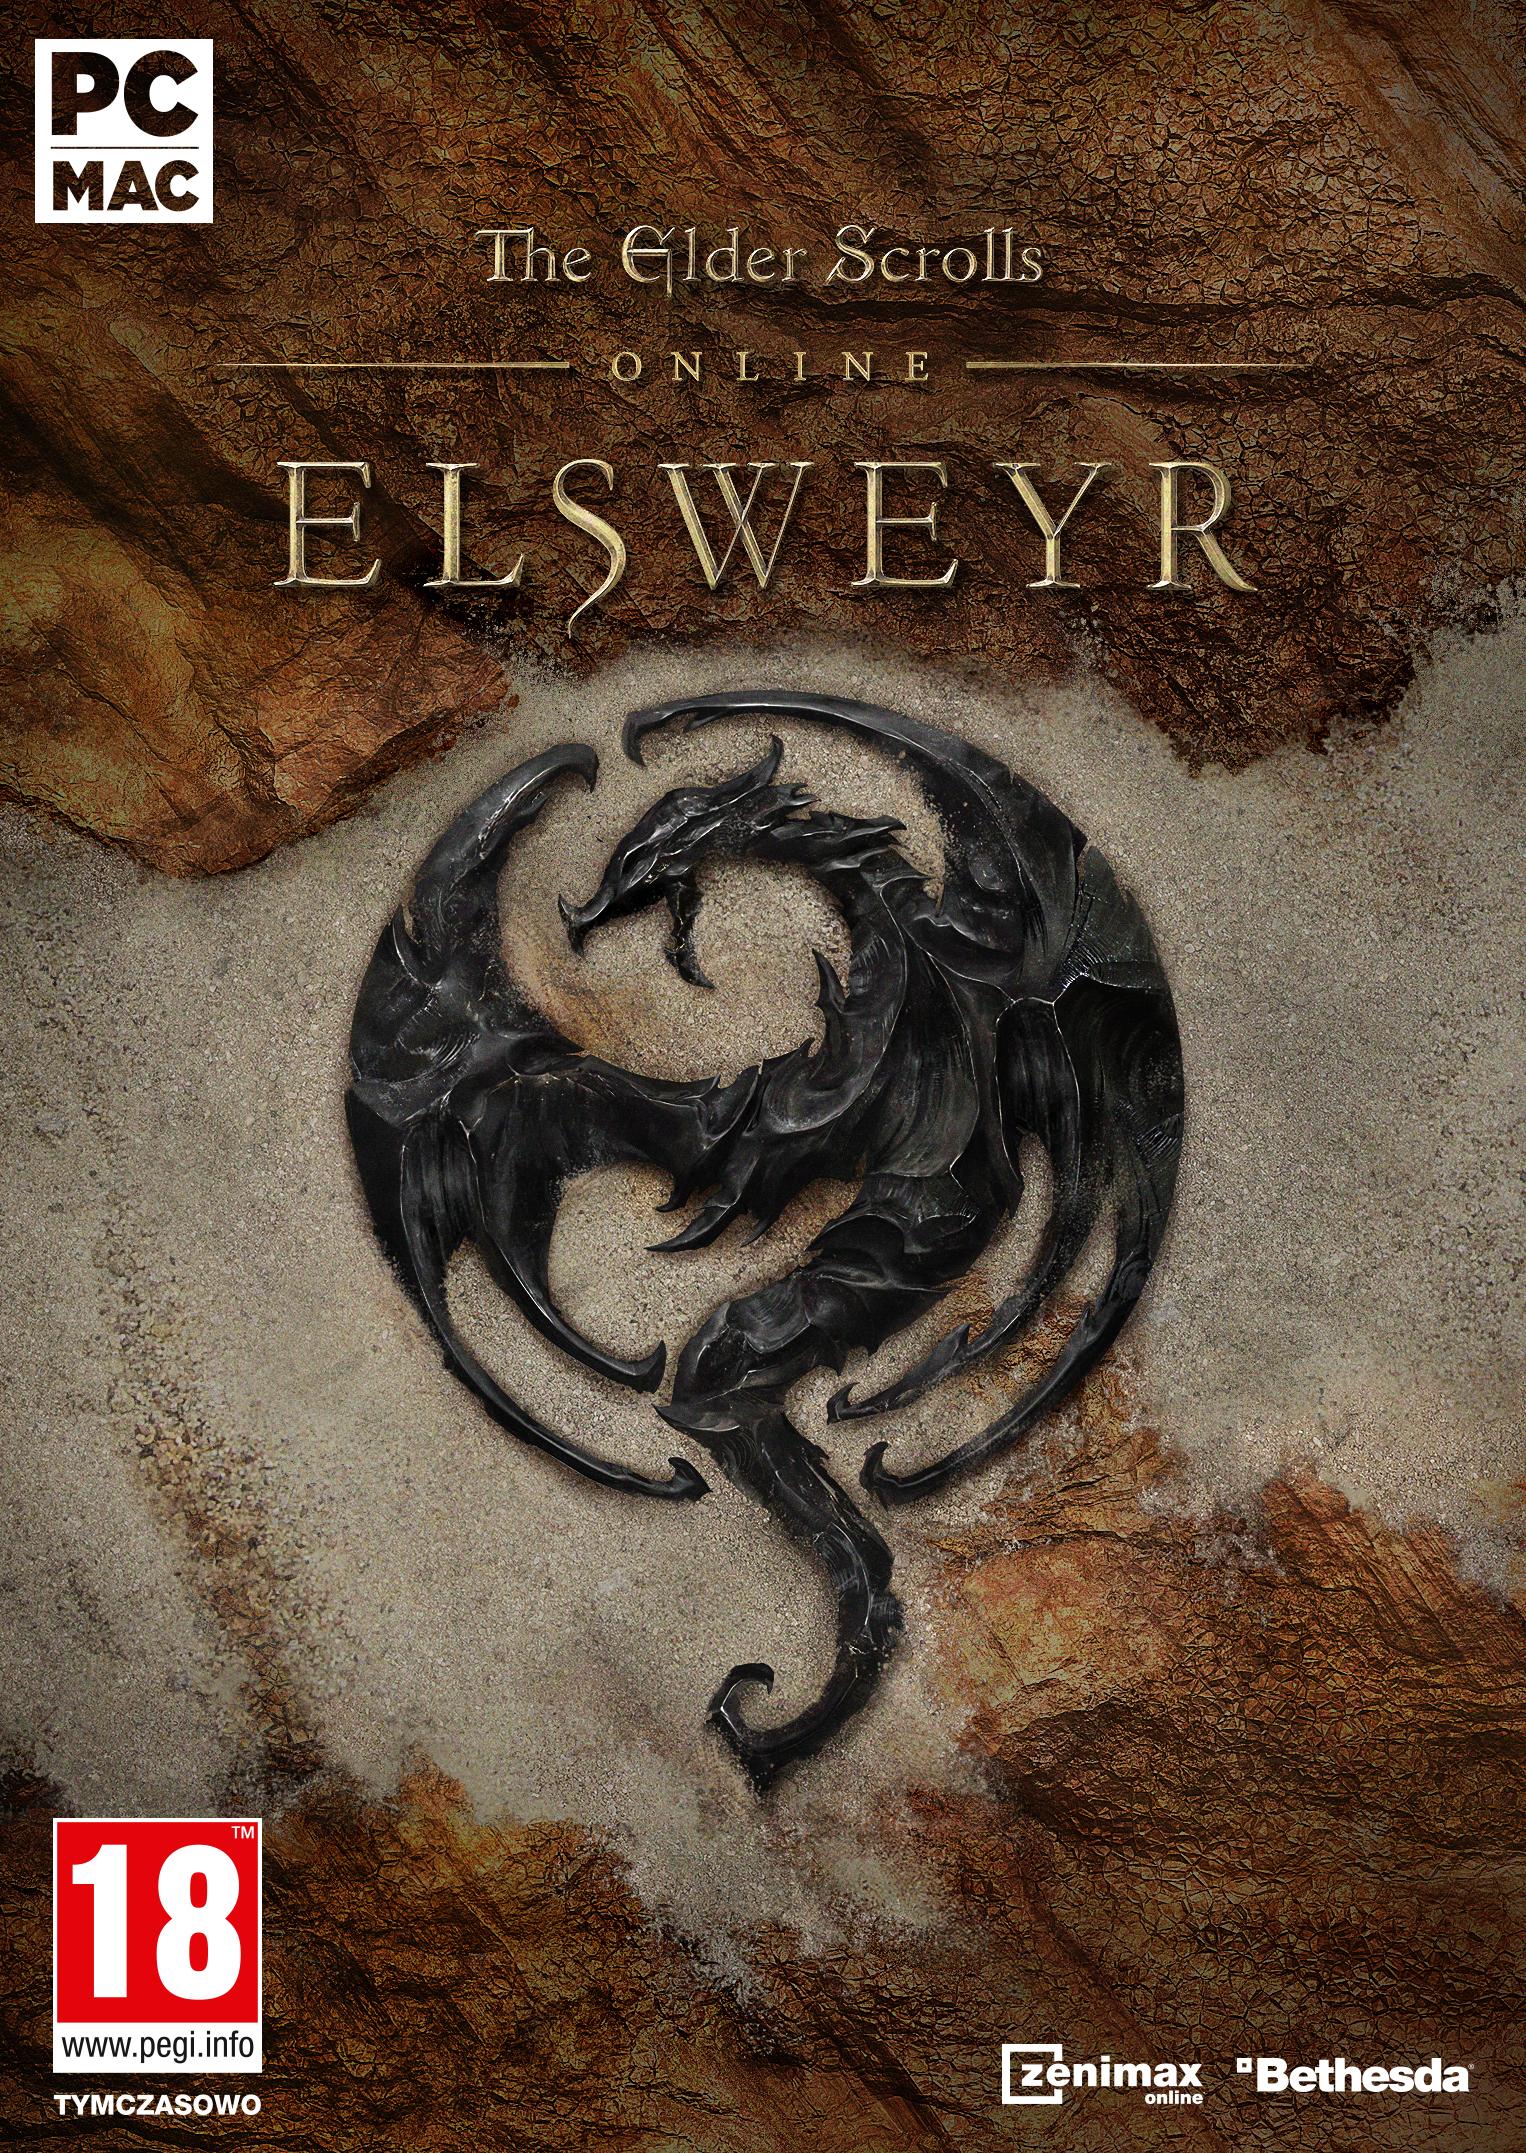 The Elder Scrolls Online - Elsweyr Digital Collector's Edition (PC/MAC) DIGITÁLIS